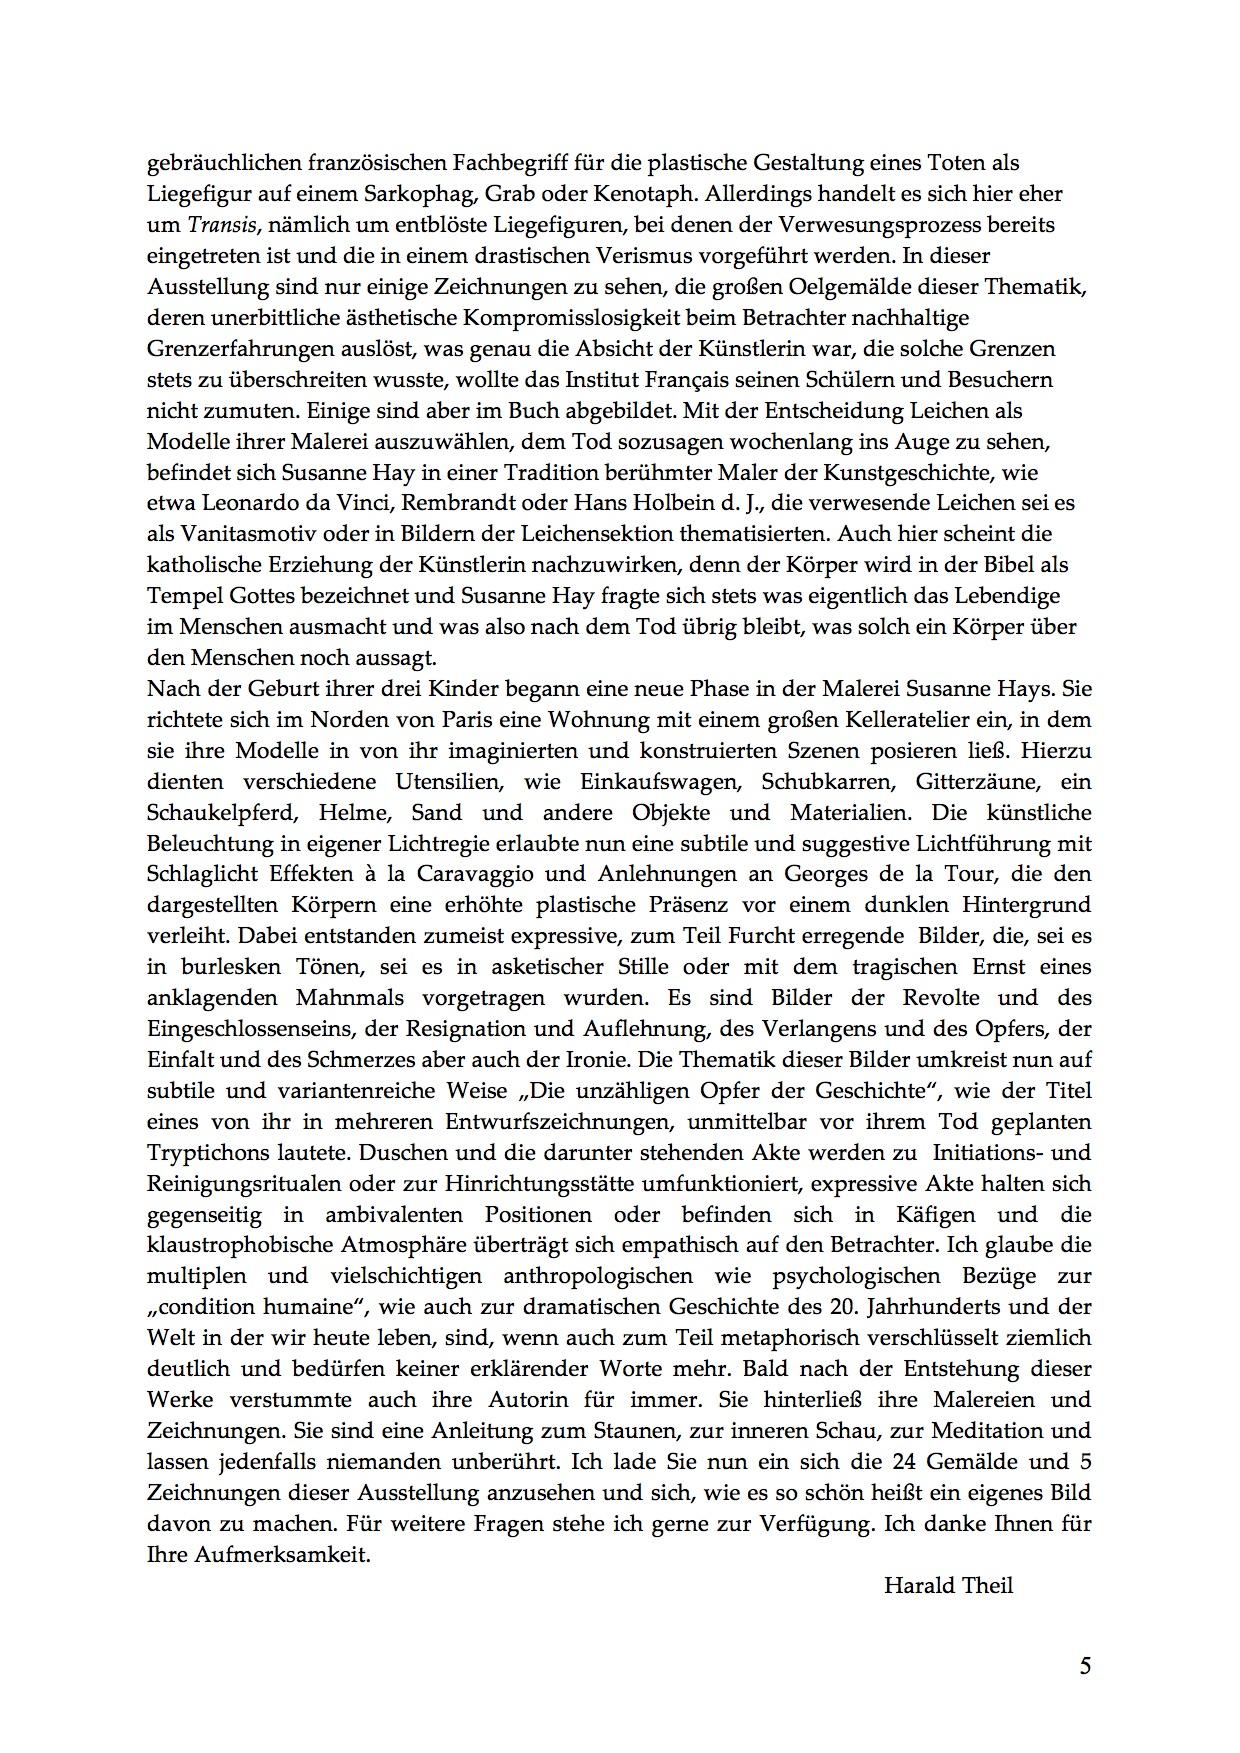 Einführung_Institut_Français_Stuttgart_-_5